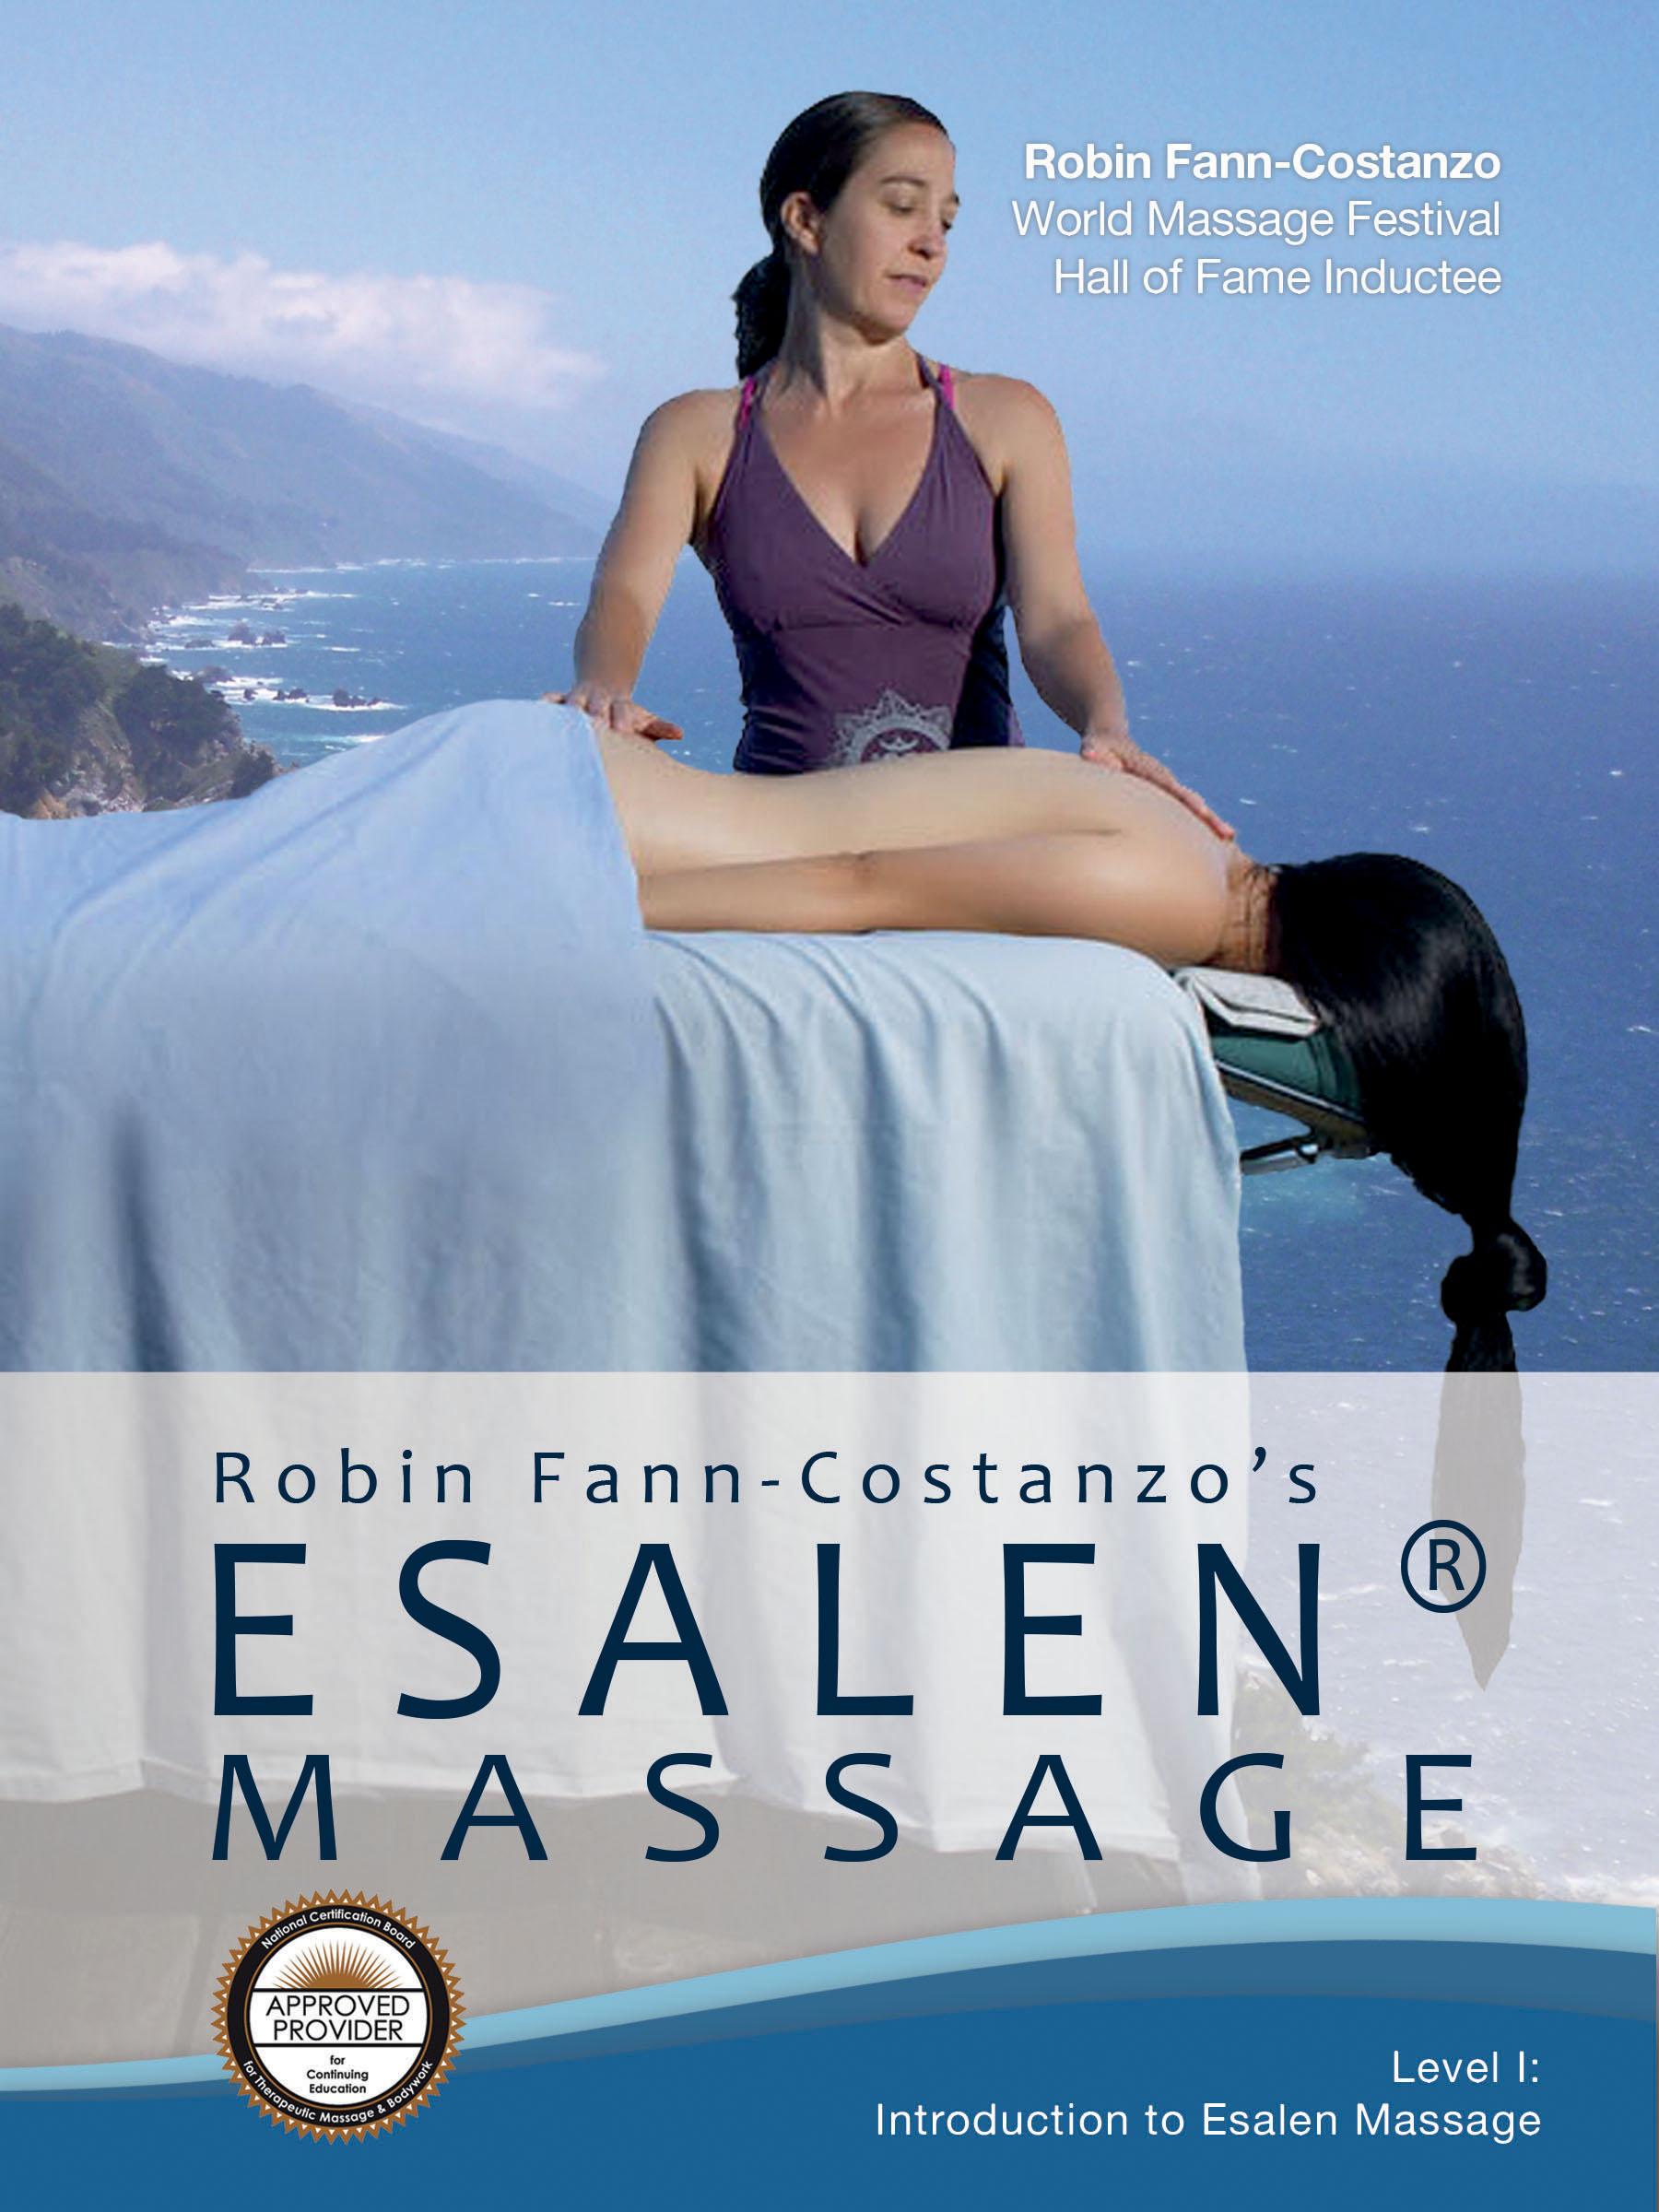 Robin Fann-Costanzo's Introduction to Esalen Massage